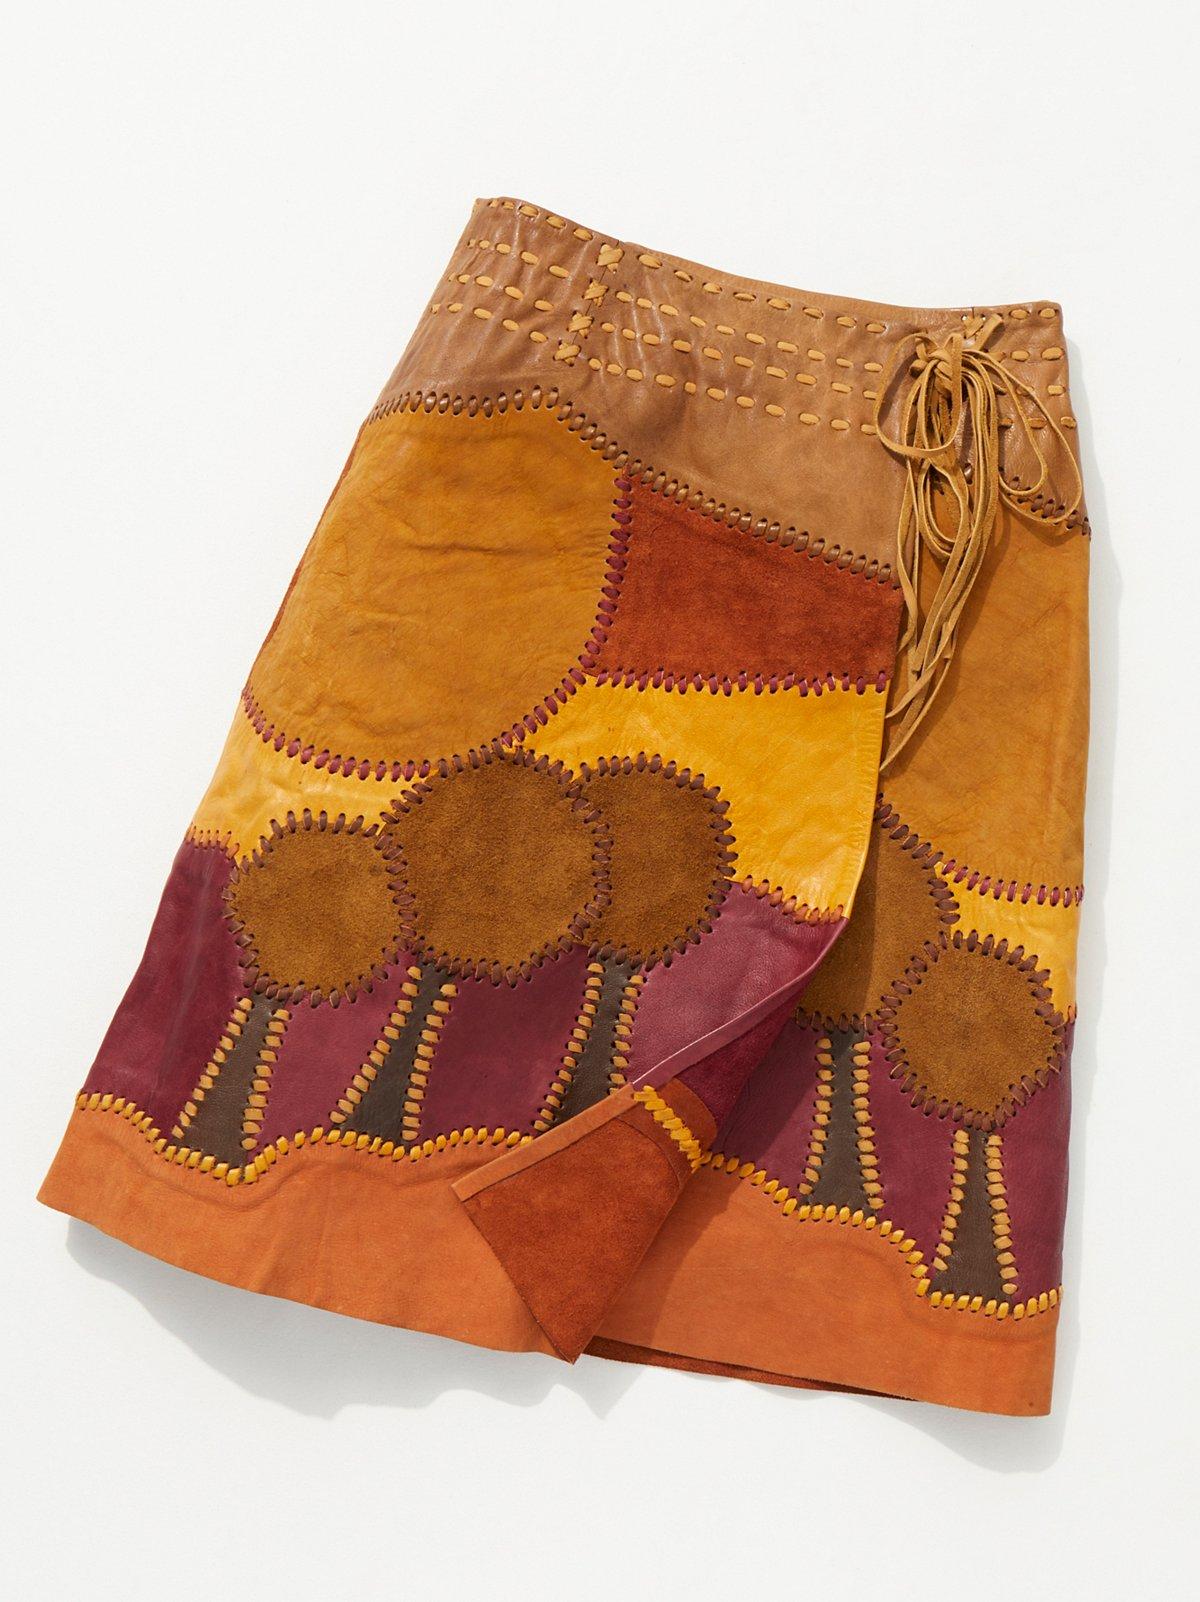 Shop the Vintage 1960s Handmade Suede Patchwork Skirt